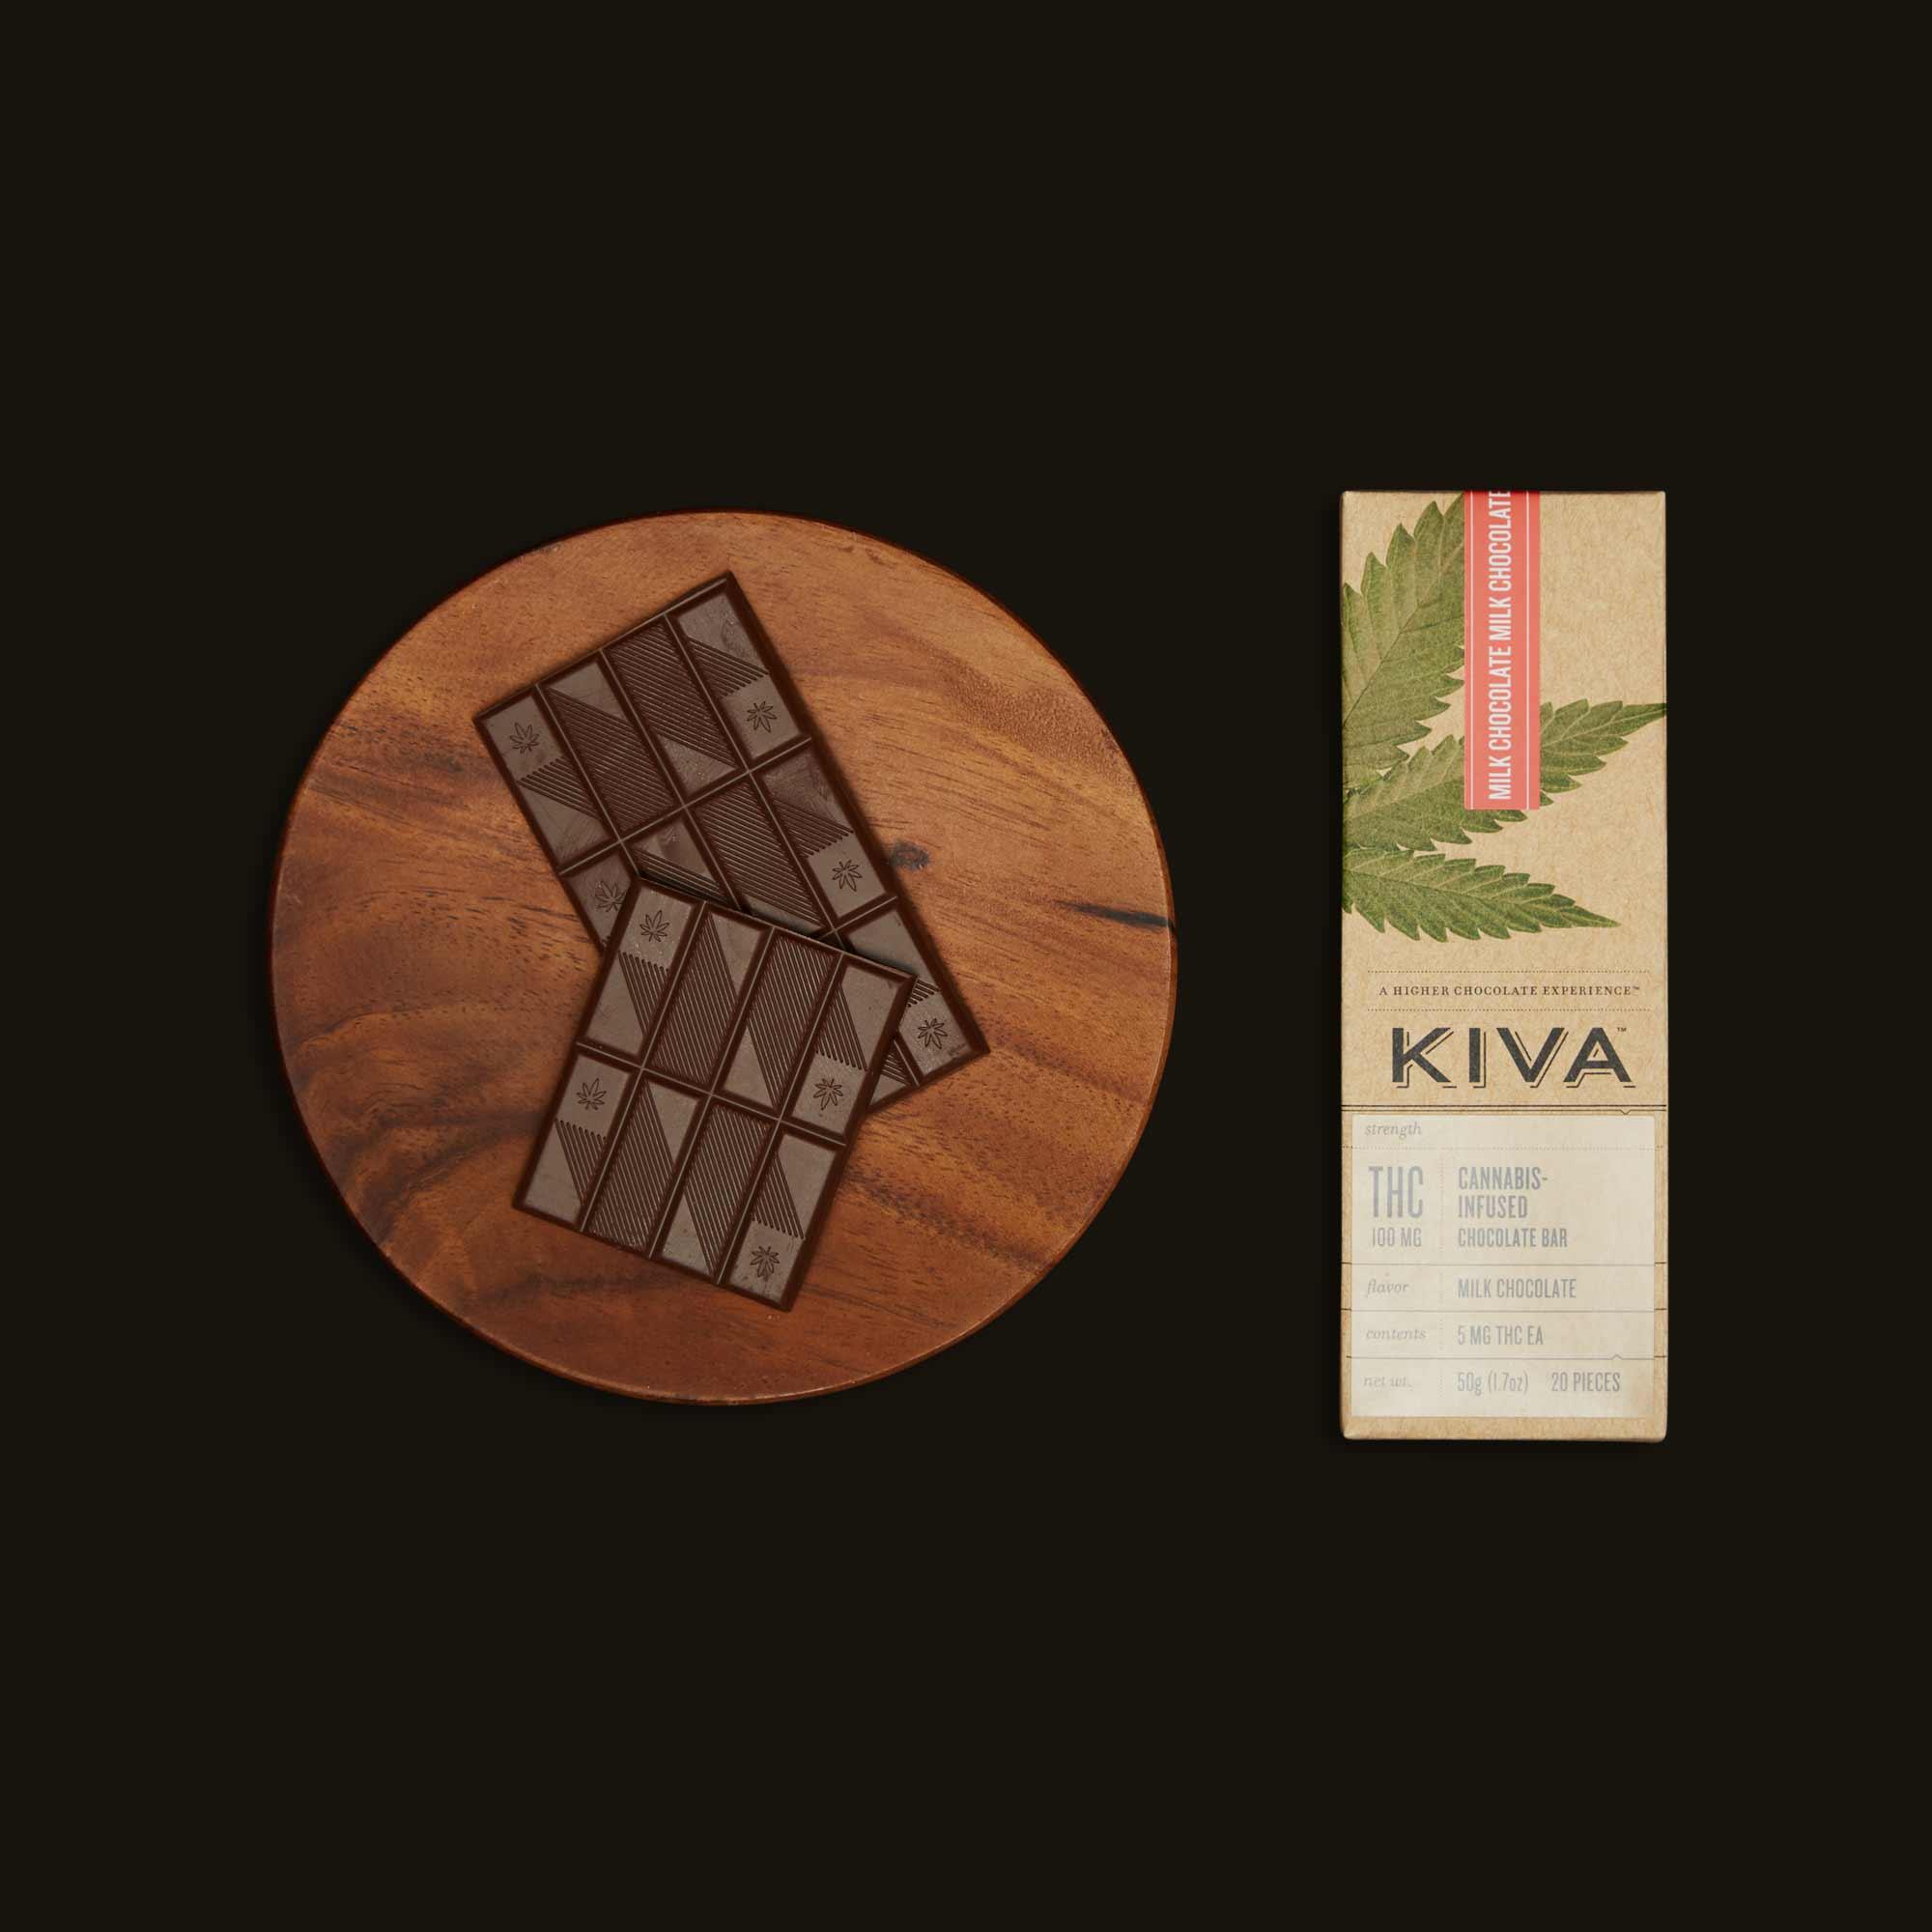 Kiva Milk Chocolate Bar on a plate